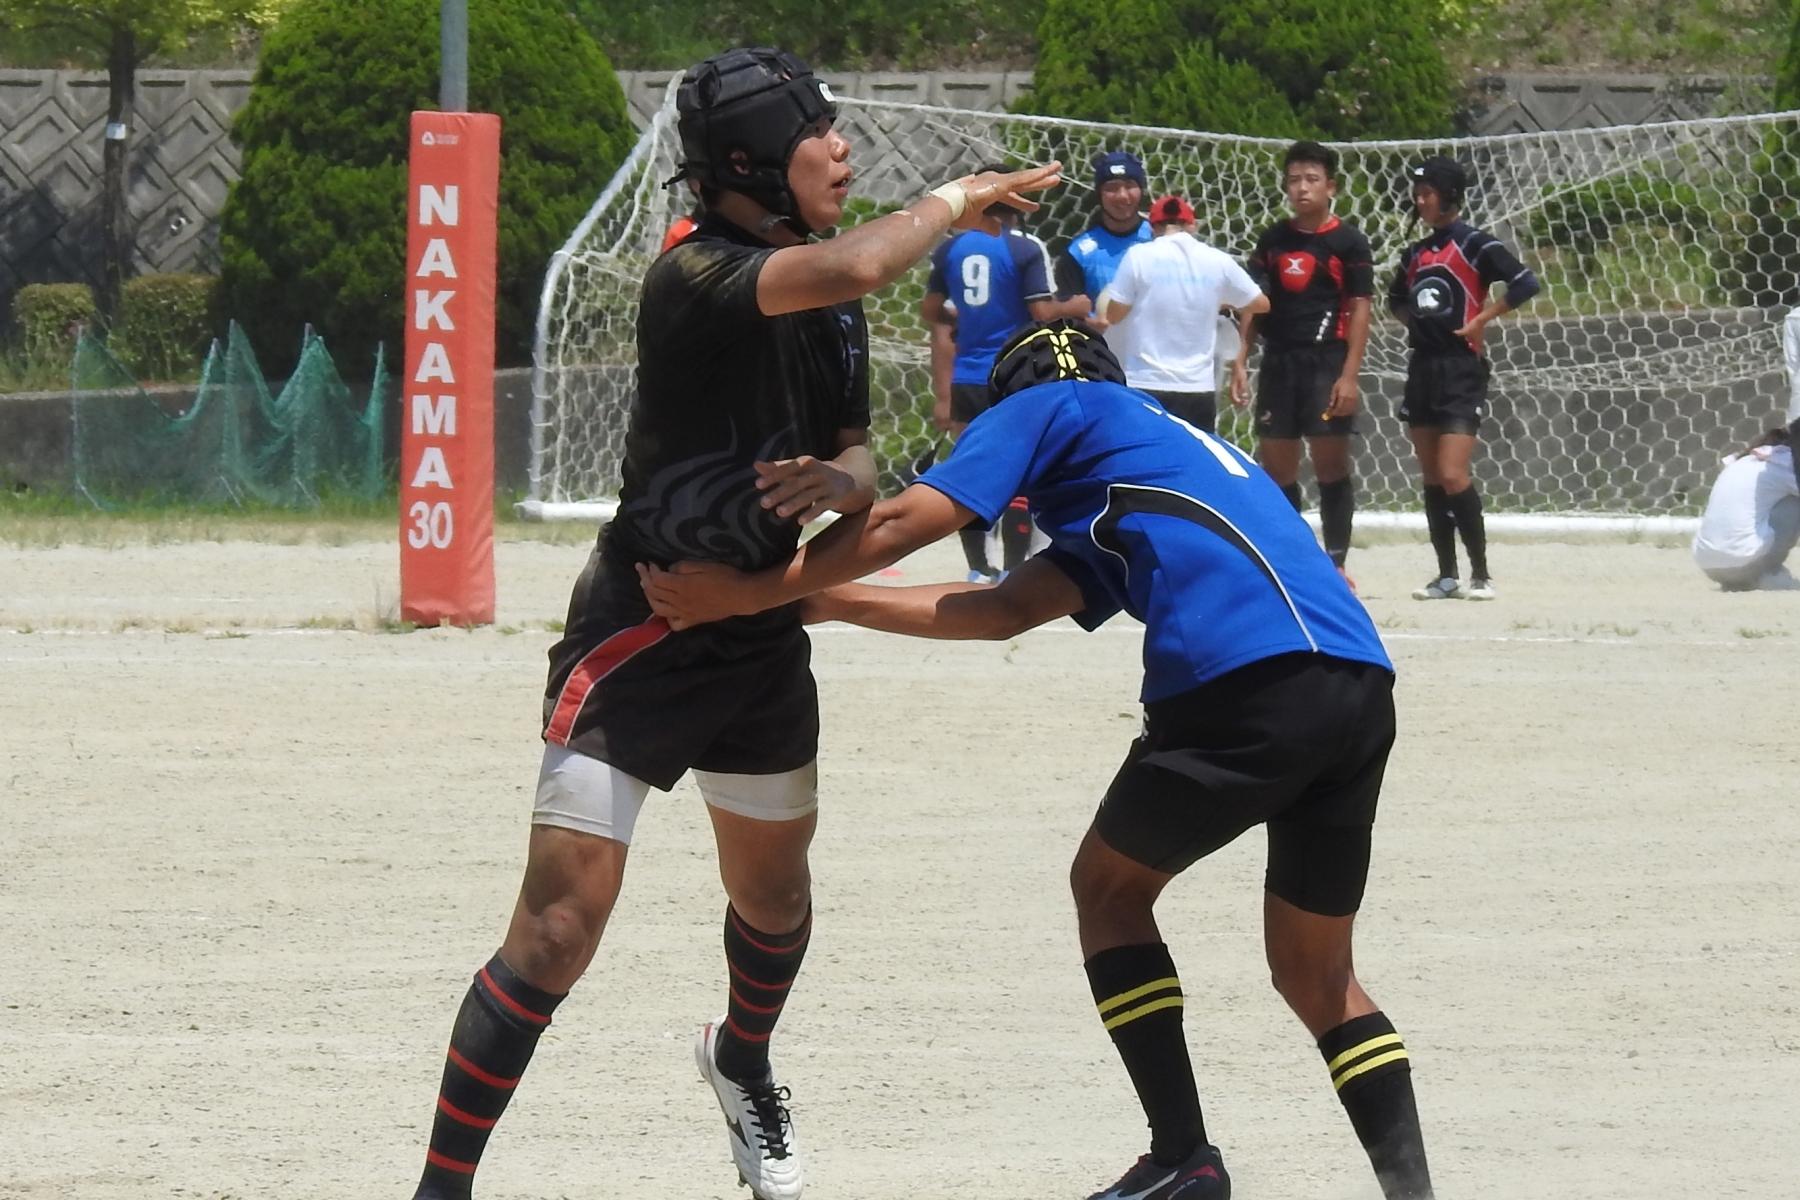 http://kokura-rugby.sakura.ne.jp/180806_130926_0074.jpg